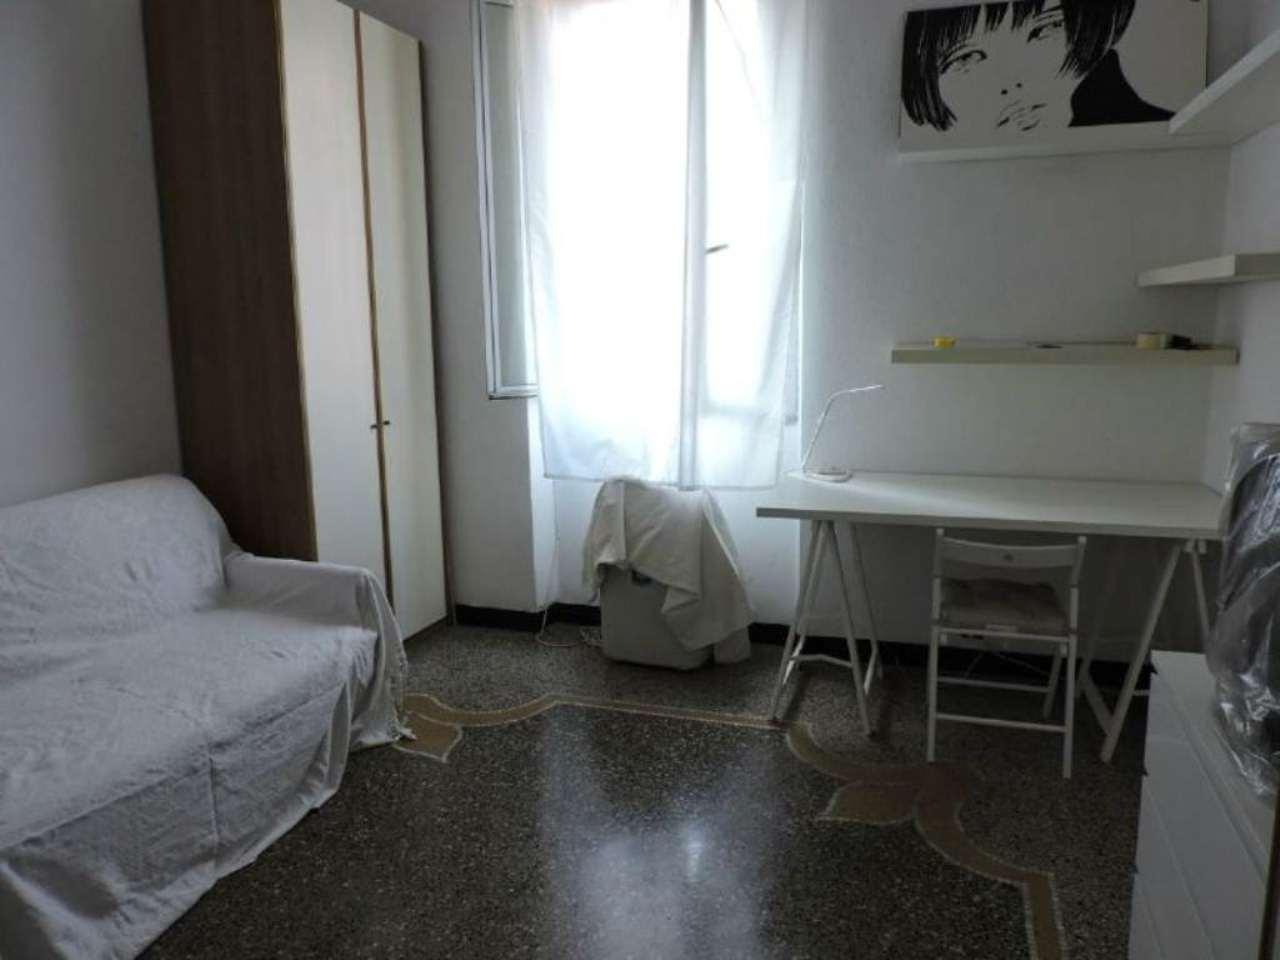 Bilocale Genova Via Dino Col 8